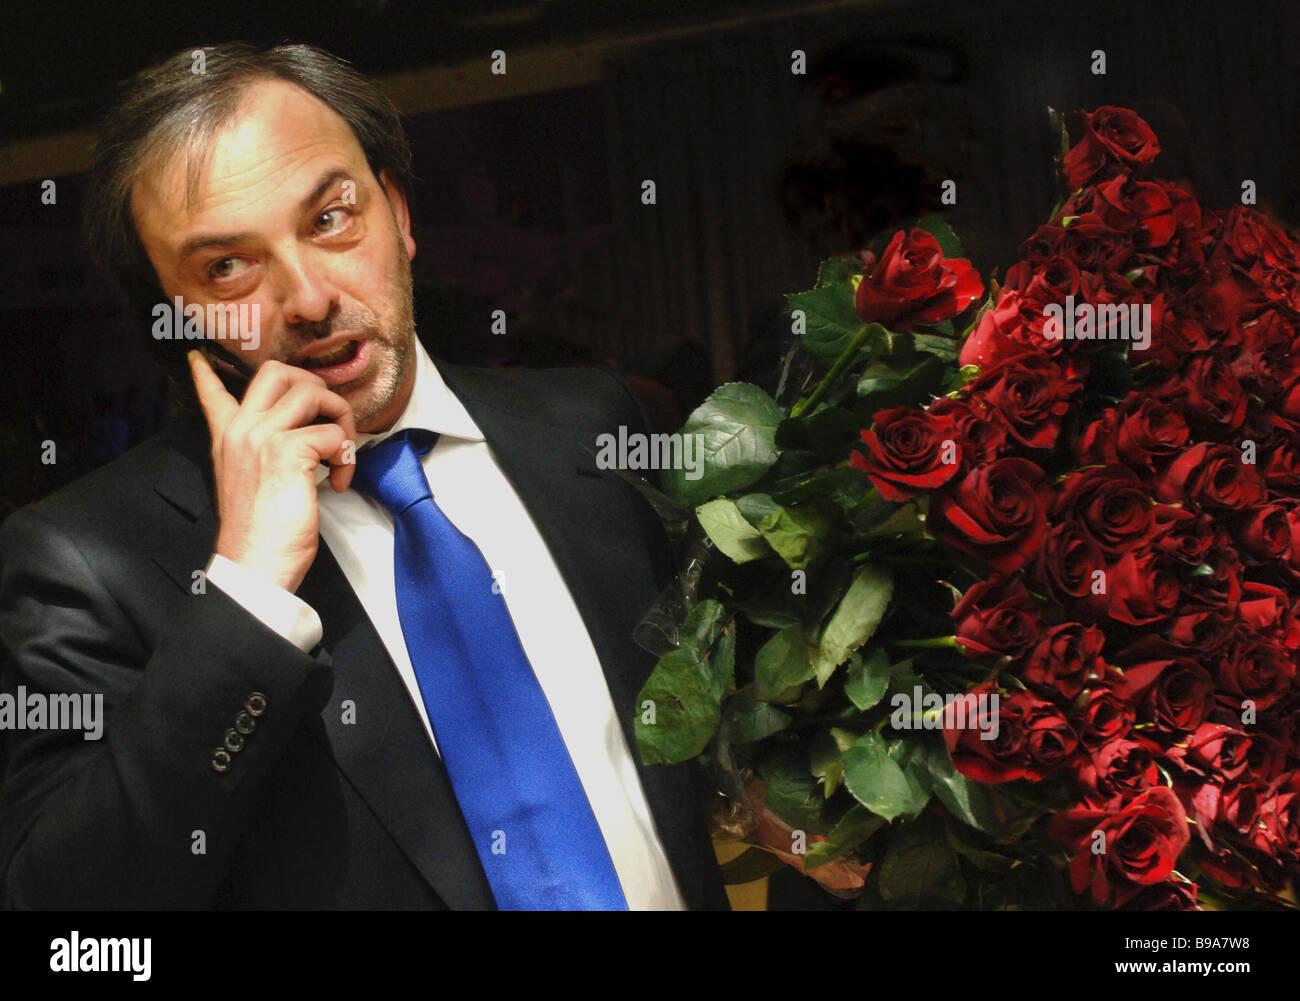 Stage decorator Boris Krasnov president of company Krasnov Design and general director of ceremony hall Forum Hall - Stock Image